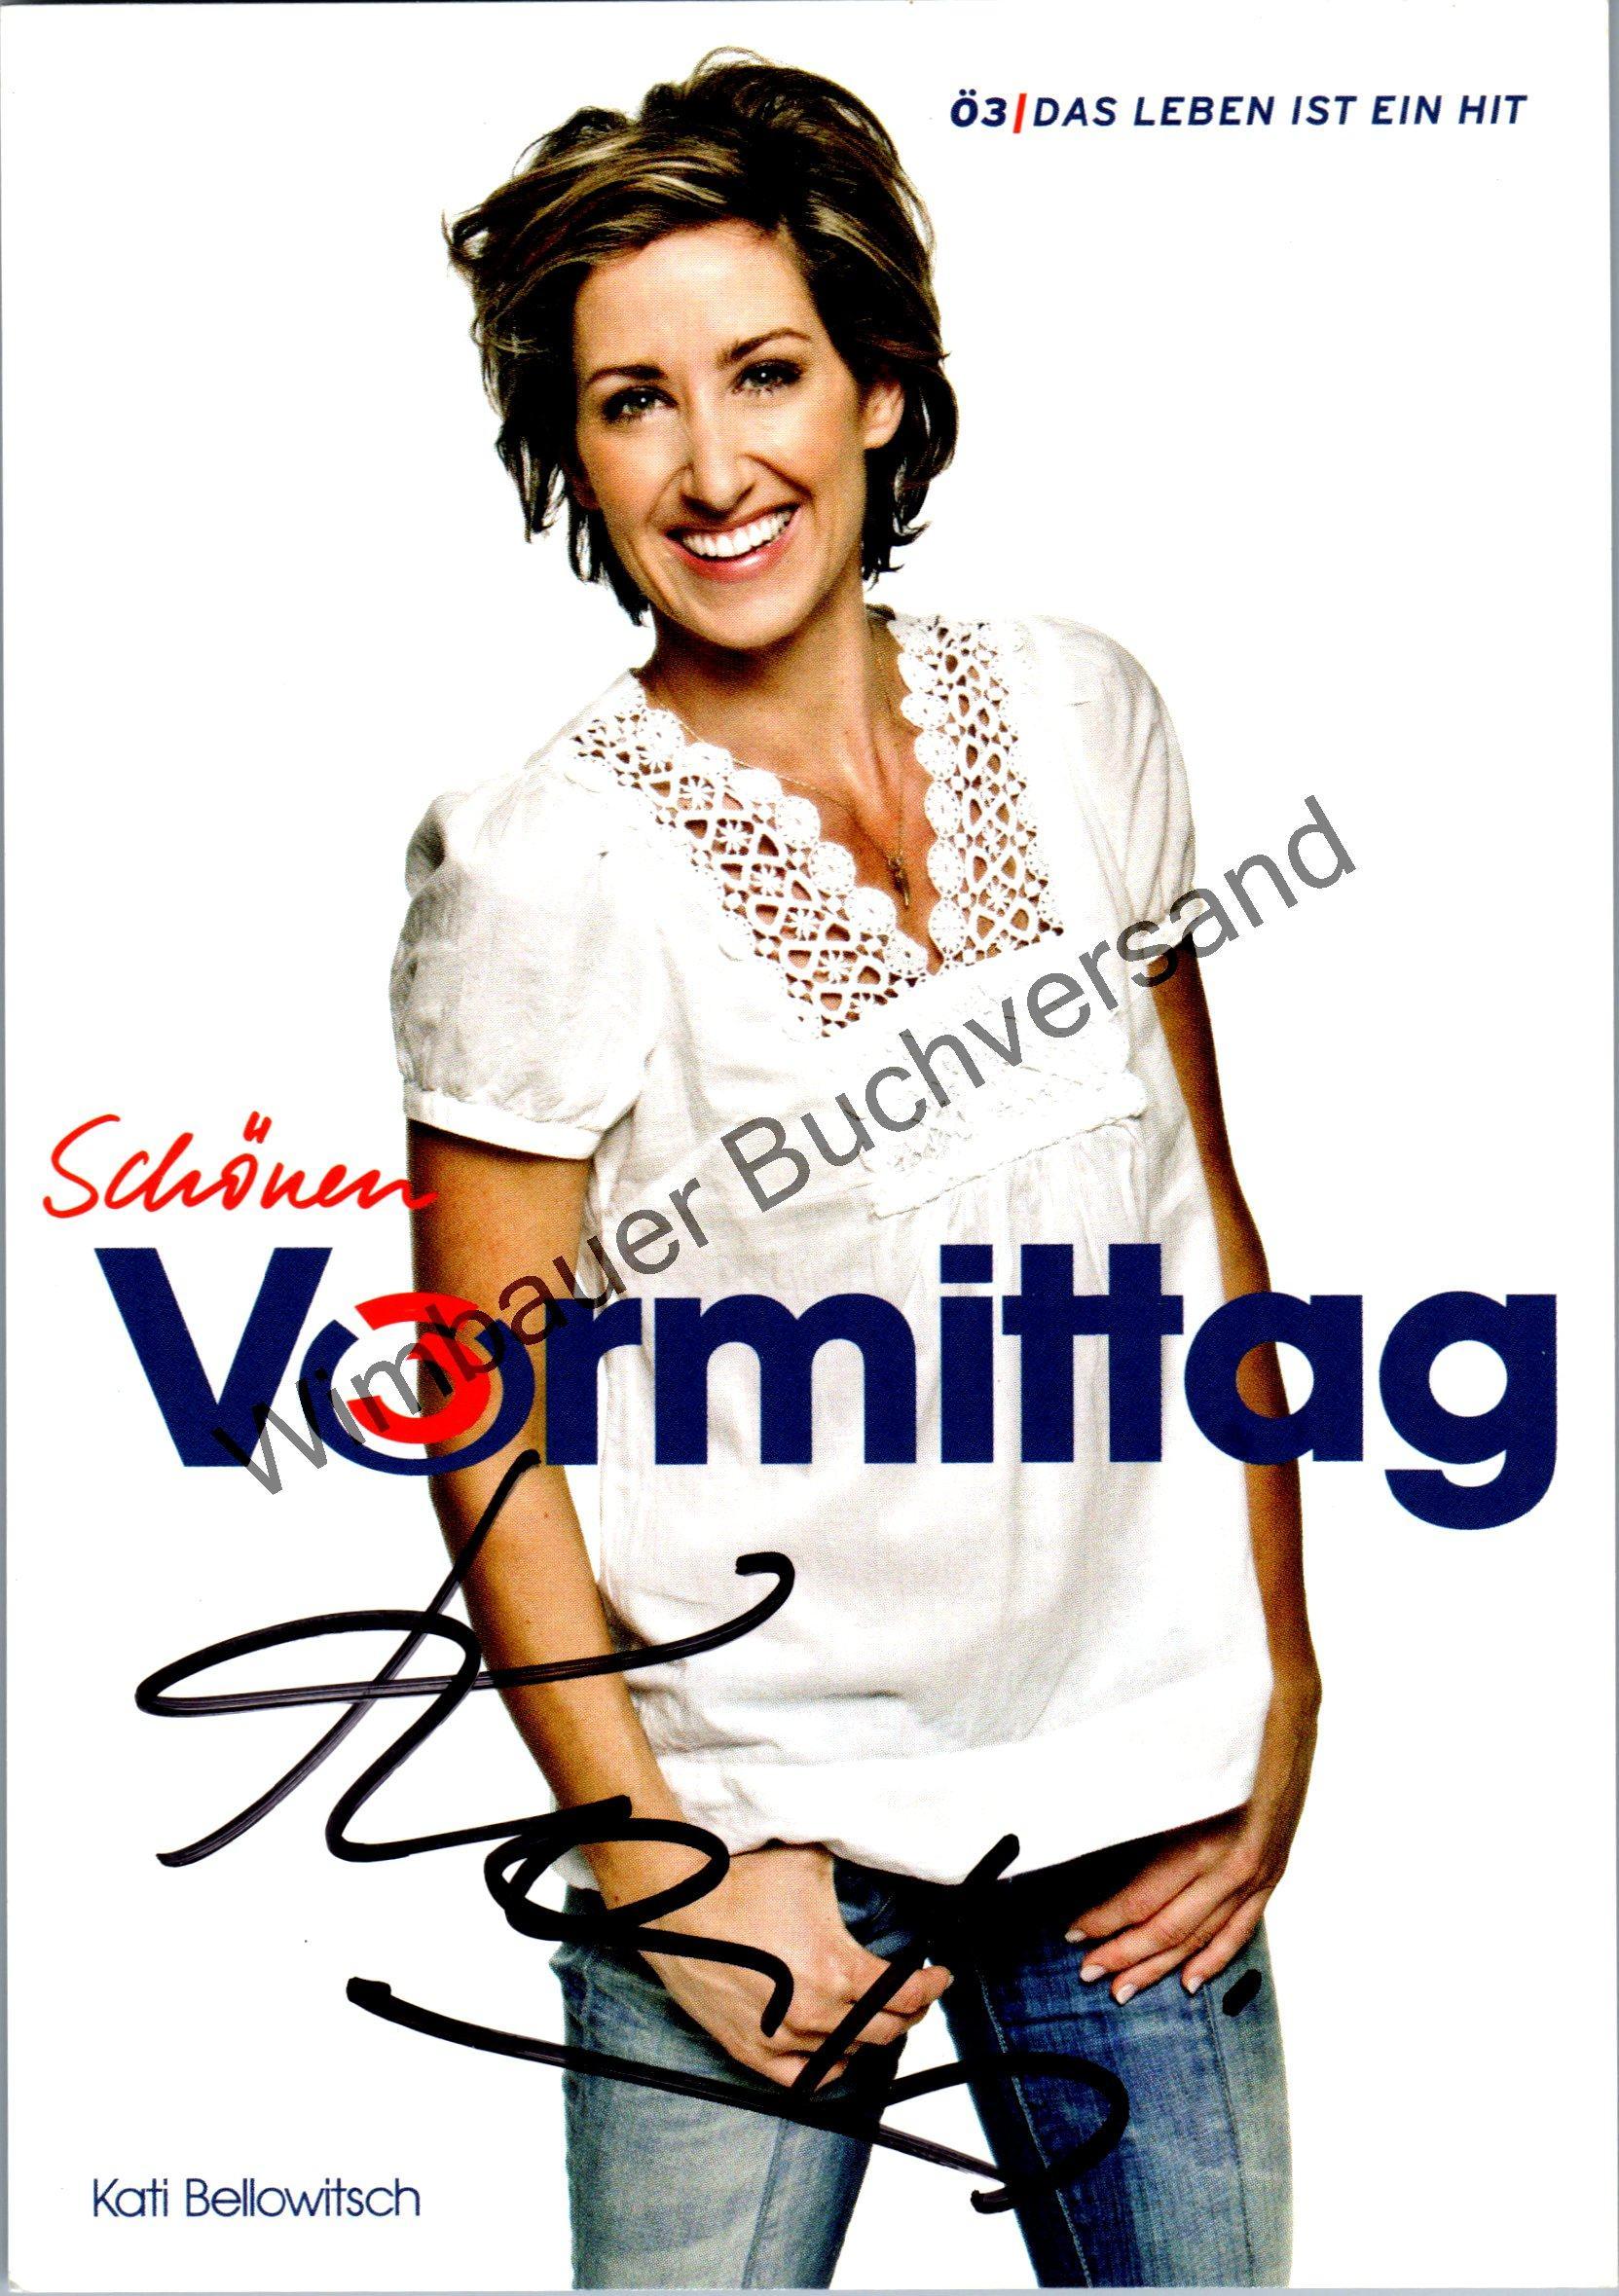 Bellowitsch, Kati : Original Autogramm Kati Bellowitsch ö3 /// Autogramm Autograph signiert signed signee